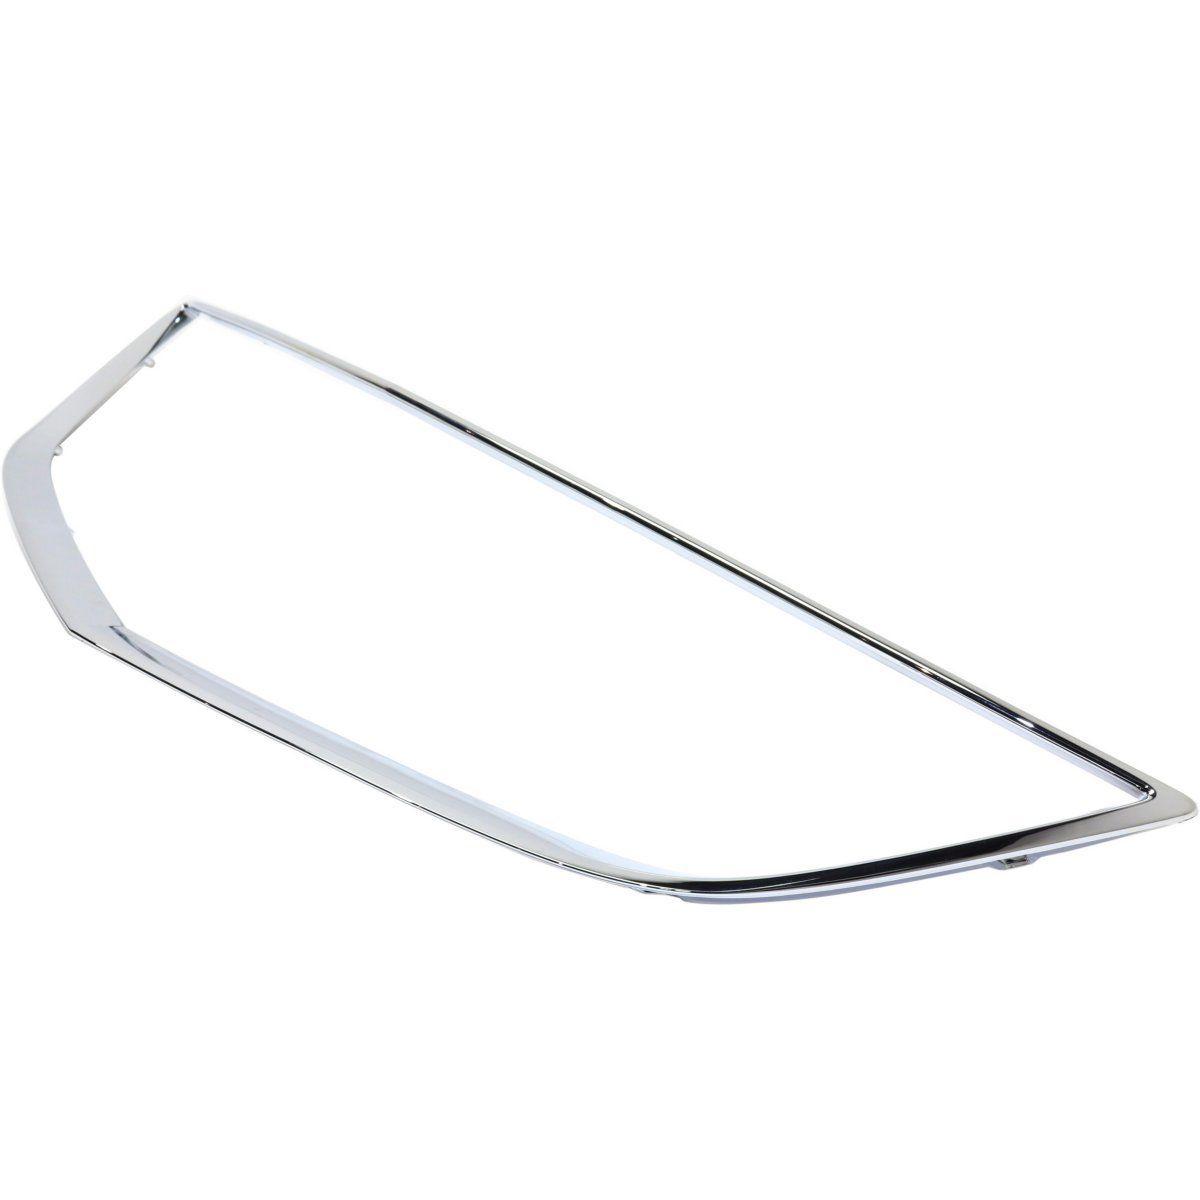 CAPA Grille Trim Grill Chrome Acura ILX 2013-2015